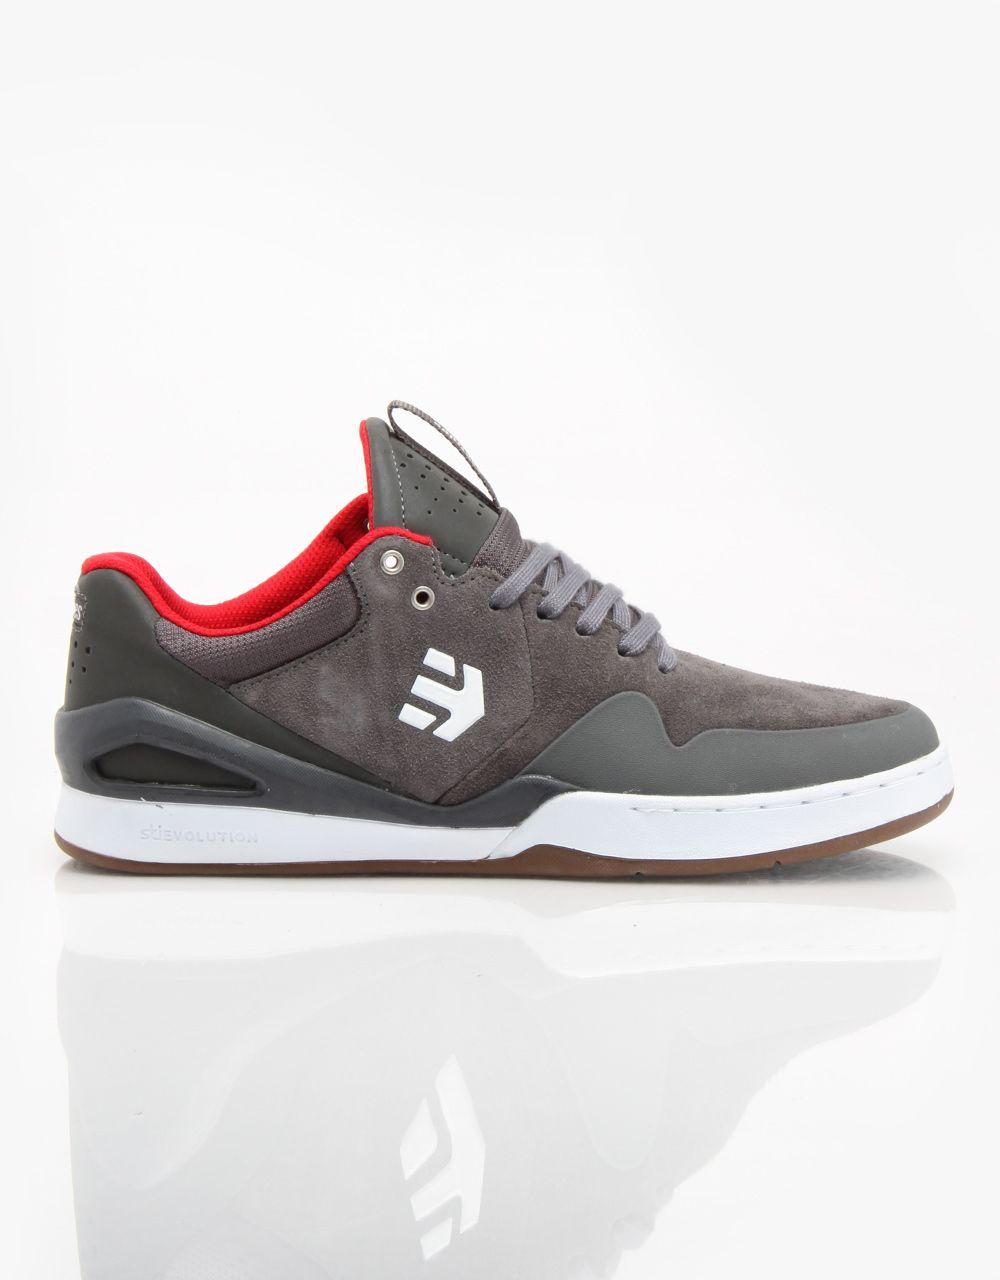 c1c38524bd Etnies Marana Elite (Ryan Sheckler) Skate Shoes - Grey Red White -  RouteOne.co.uk